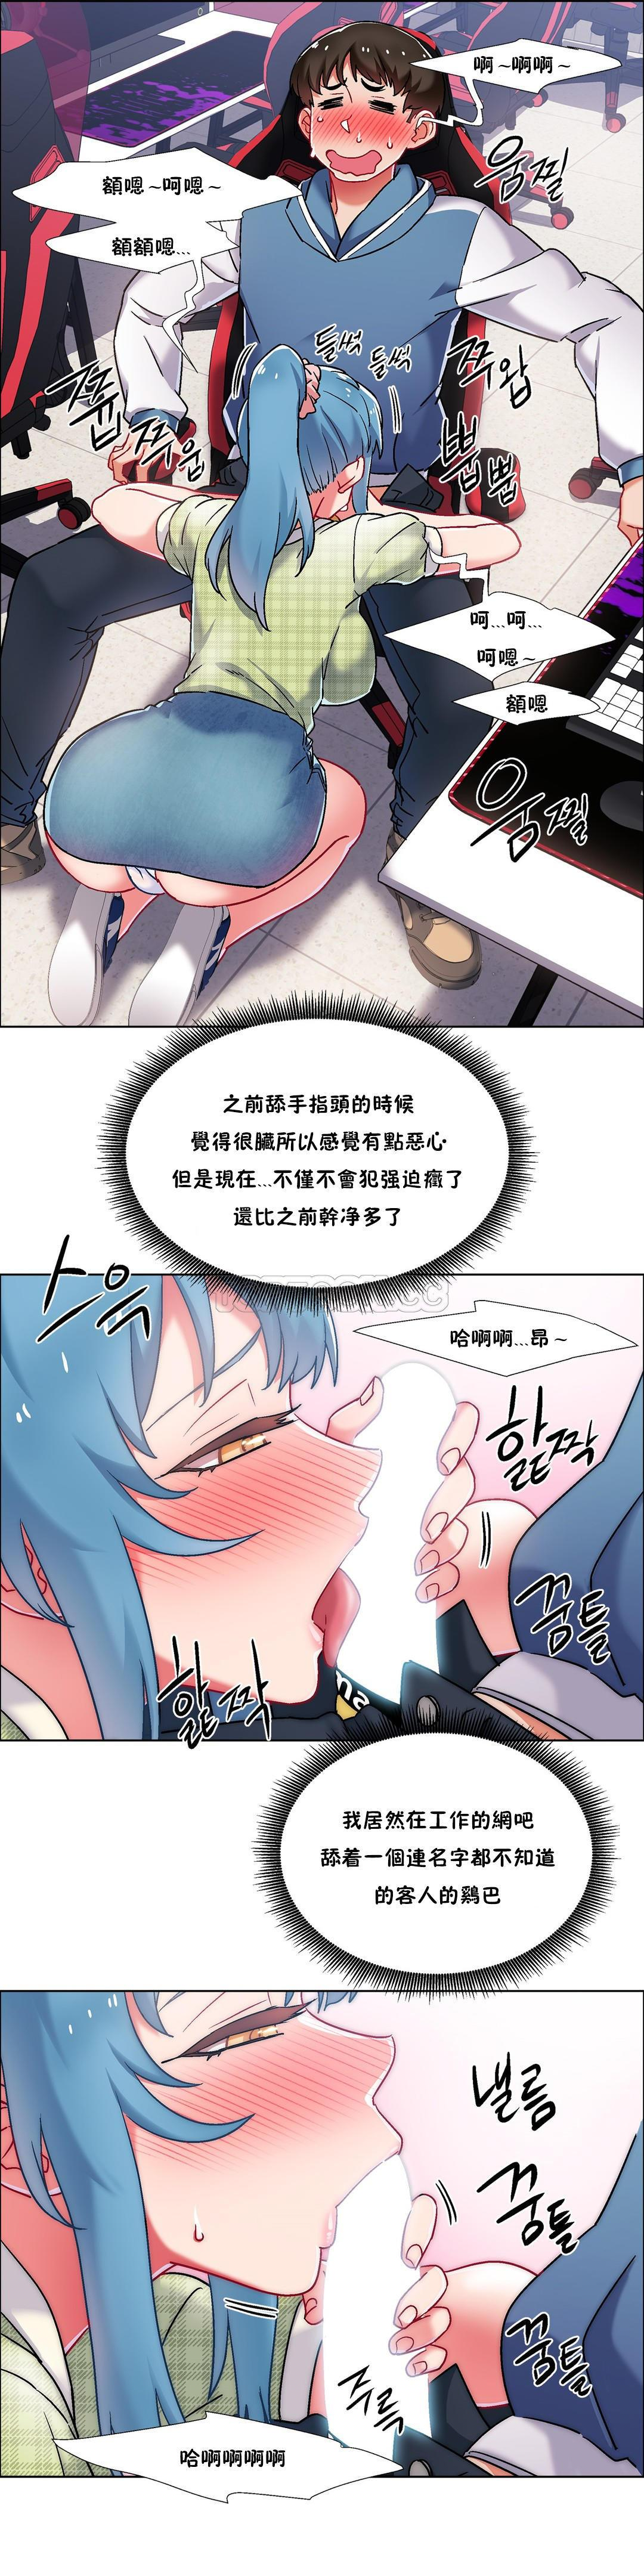 [Studio Wannabe] Rental Girls | 出租女郎 Ch. 33-58 [Chinese]  第二季 完结 116